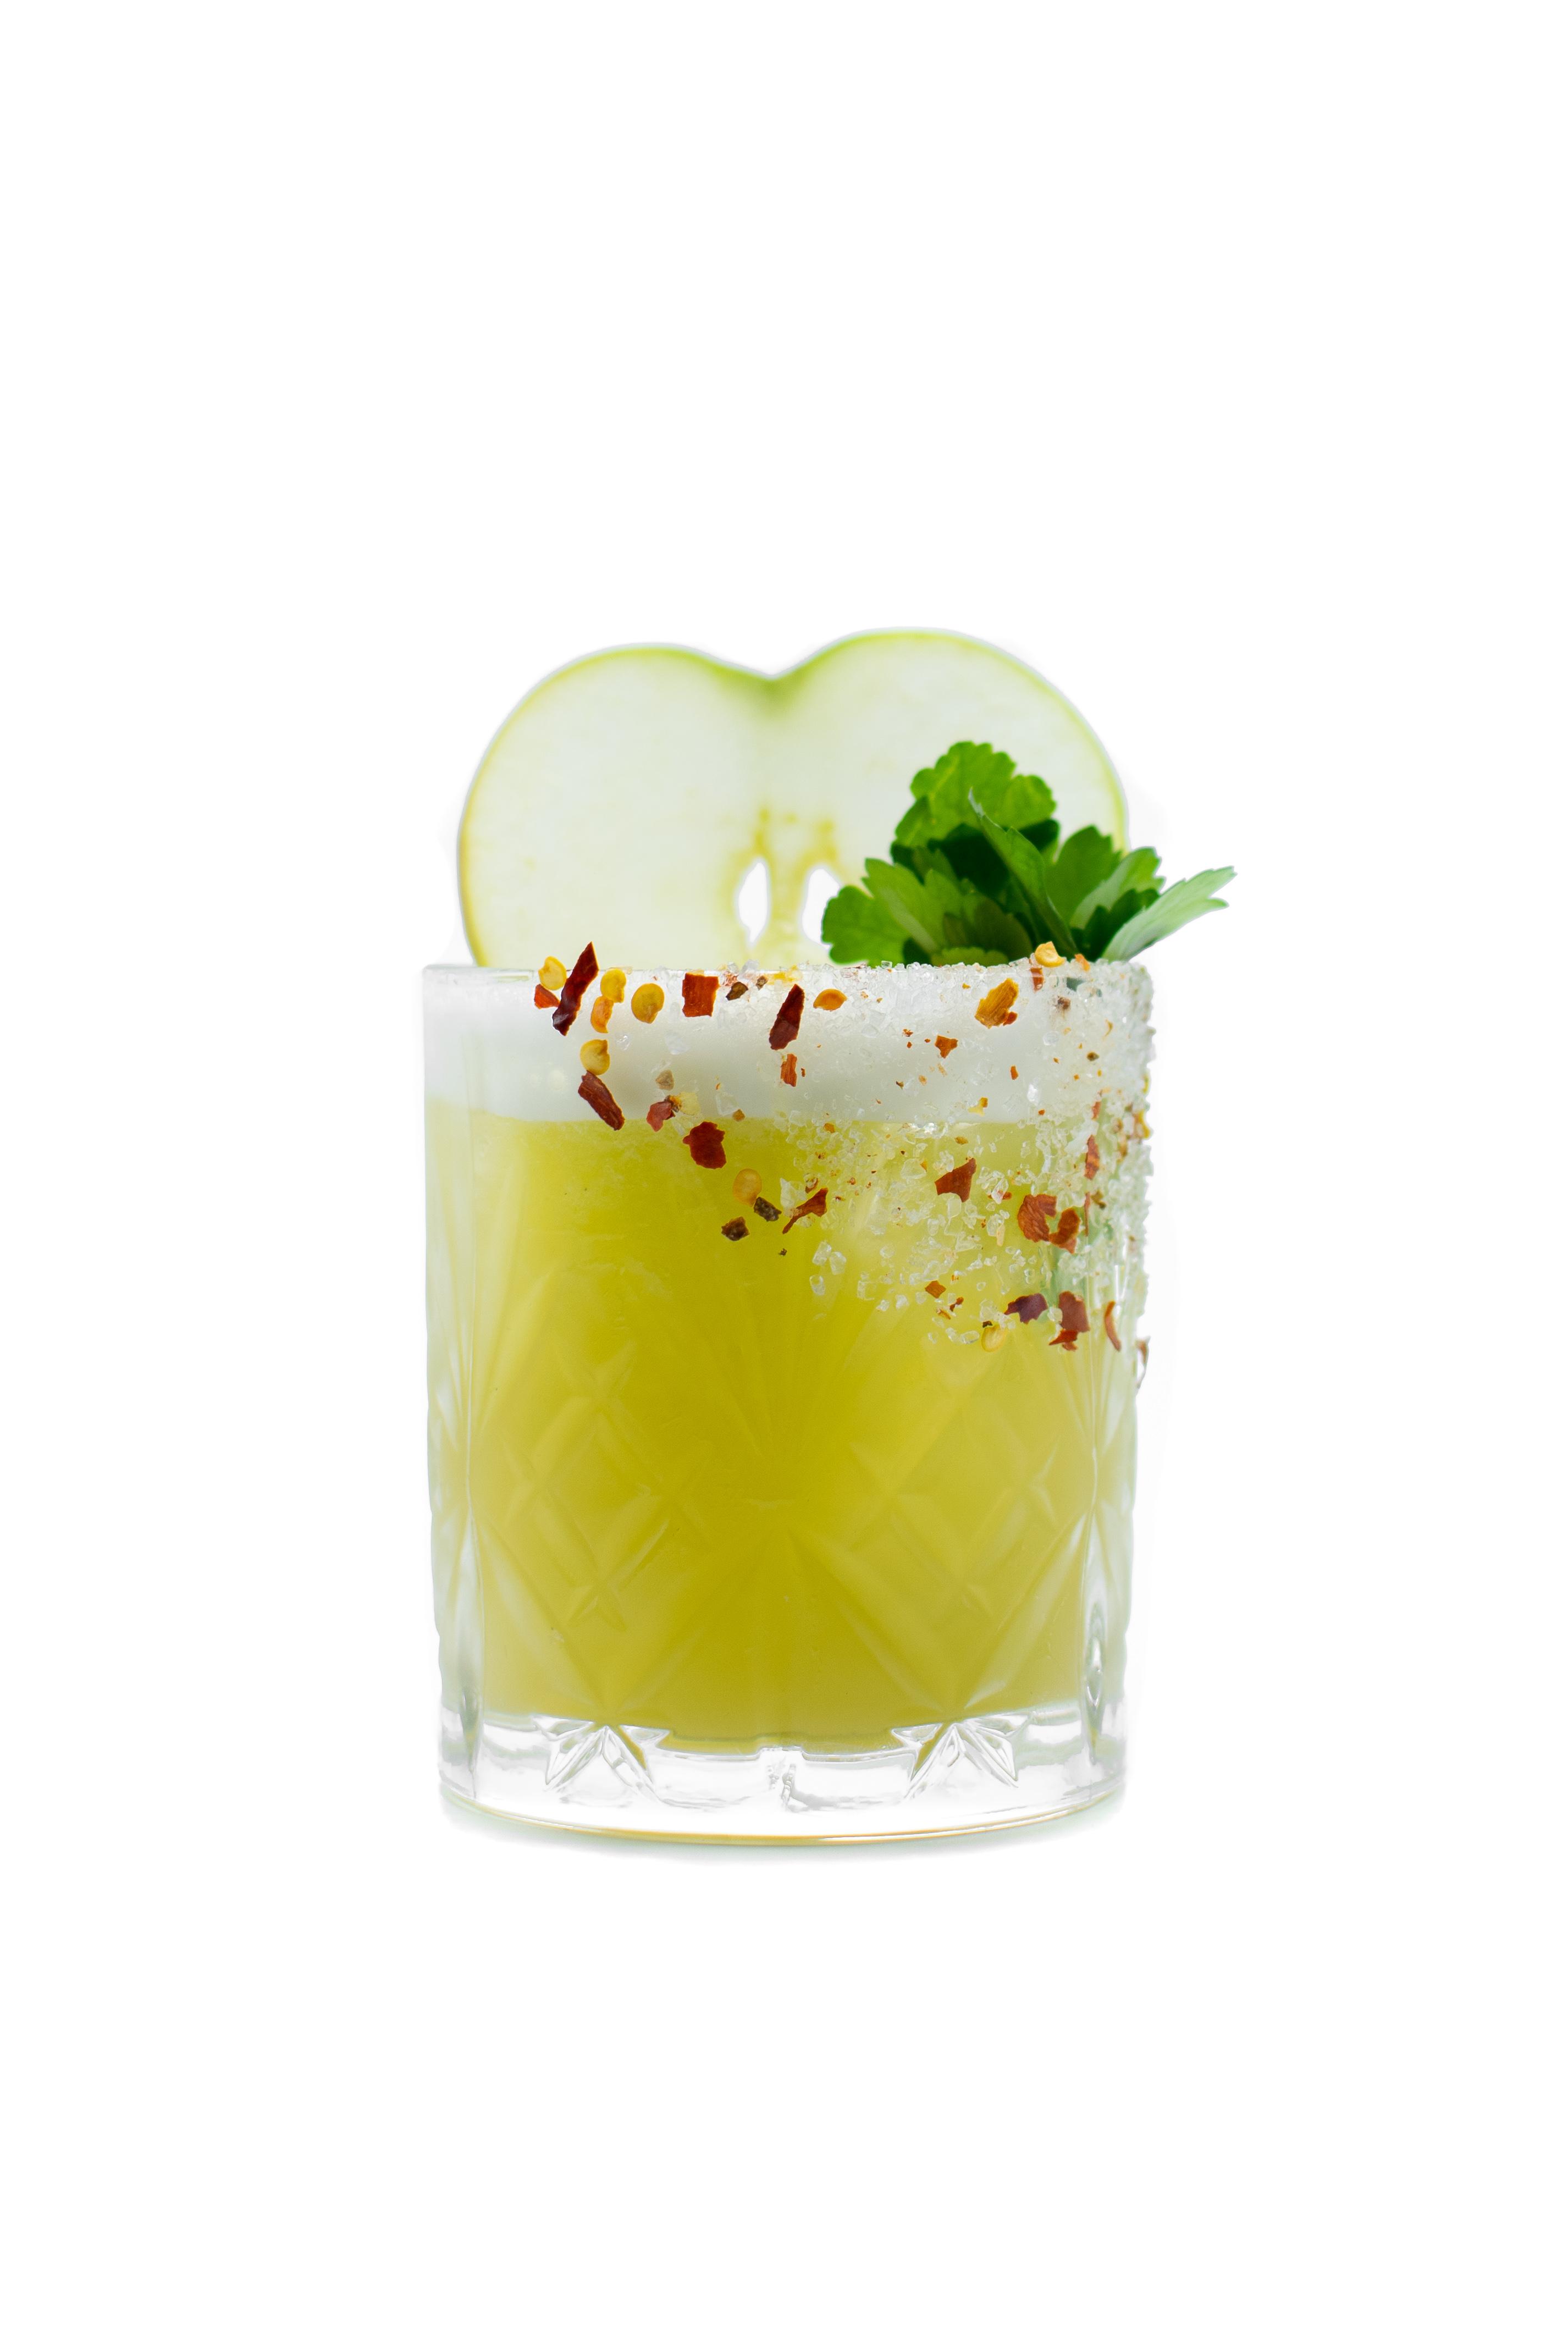 Spiced Apple Margarita